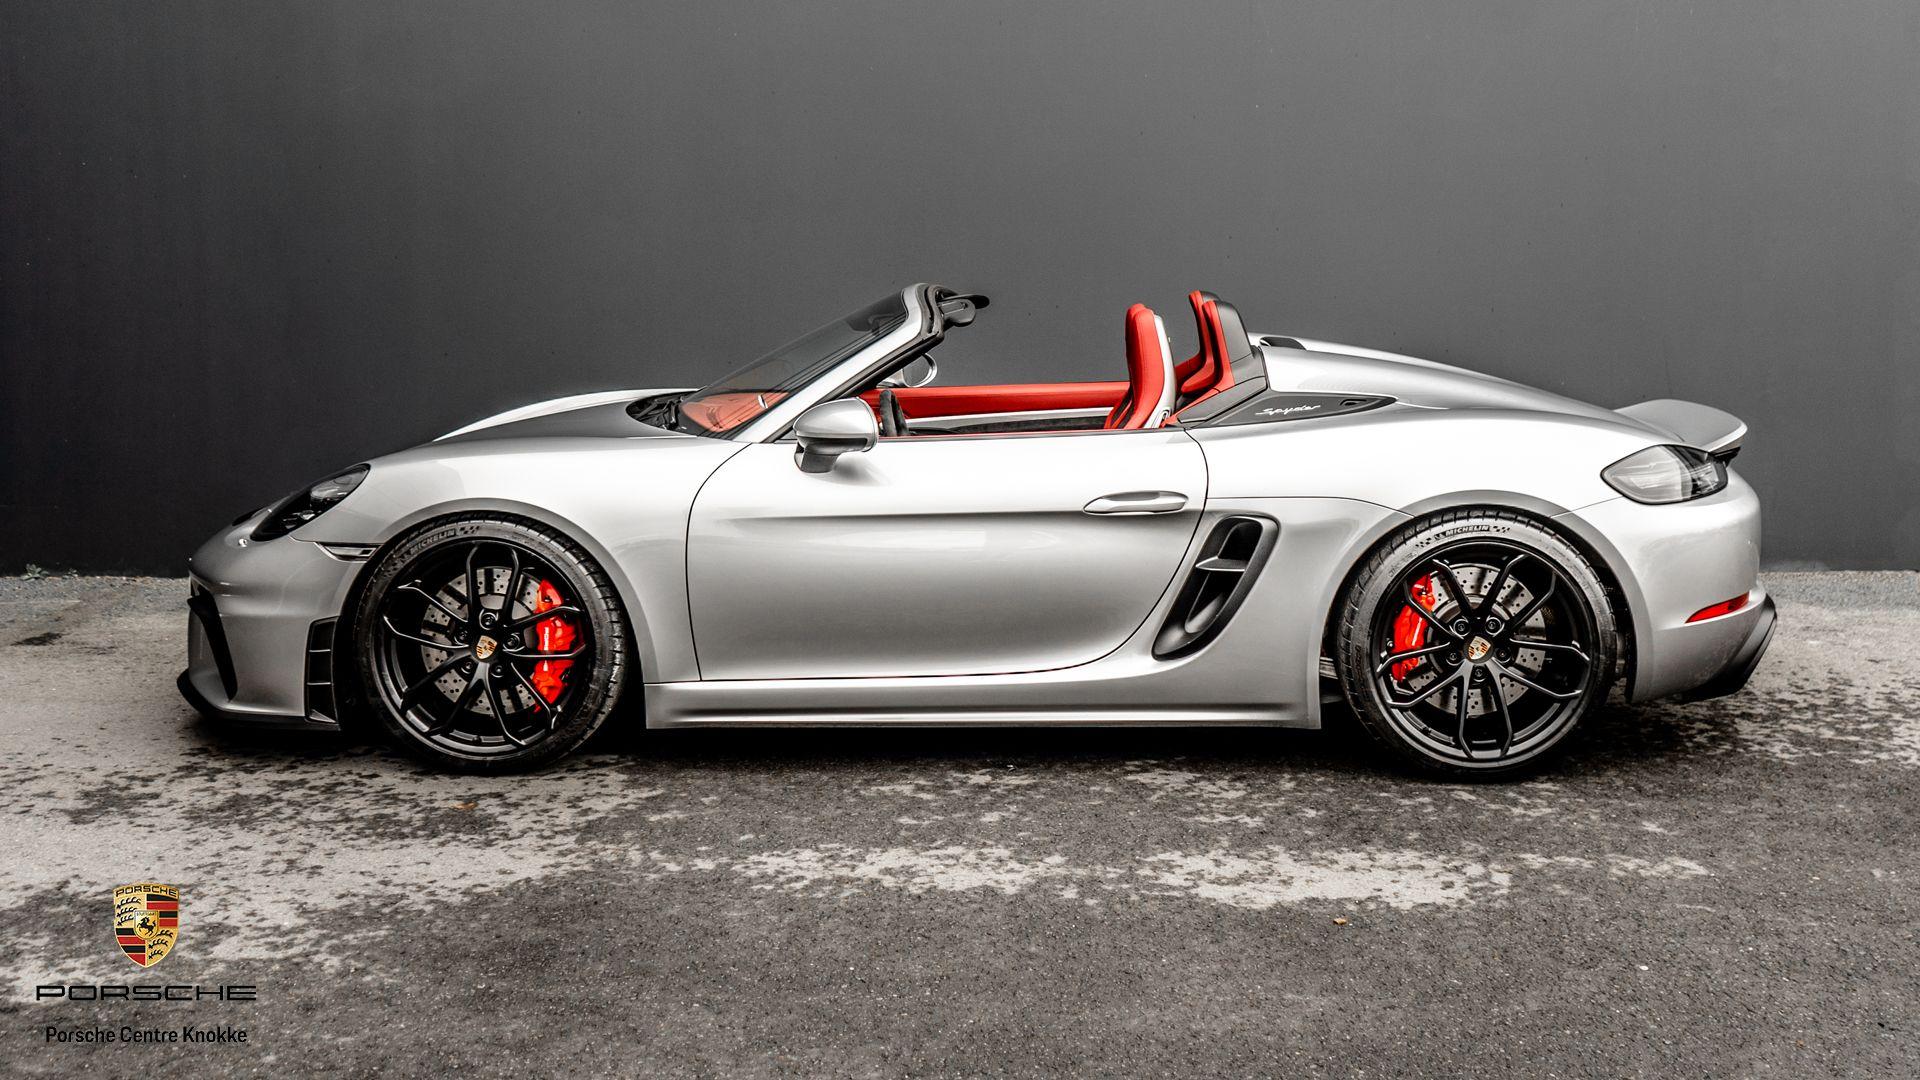 Porsche 718 Spyder 2019 Elferspot Com Marktplatz Fur Porsche Sportwagen